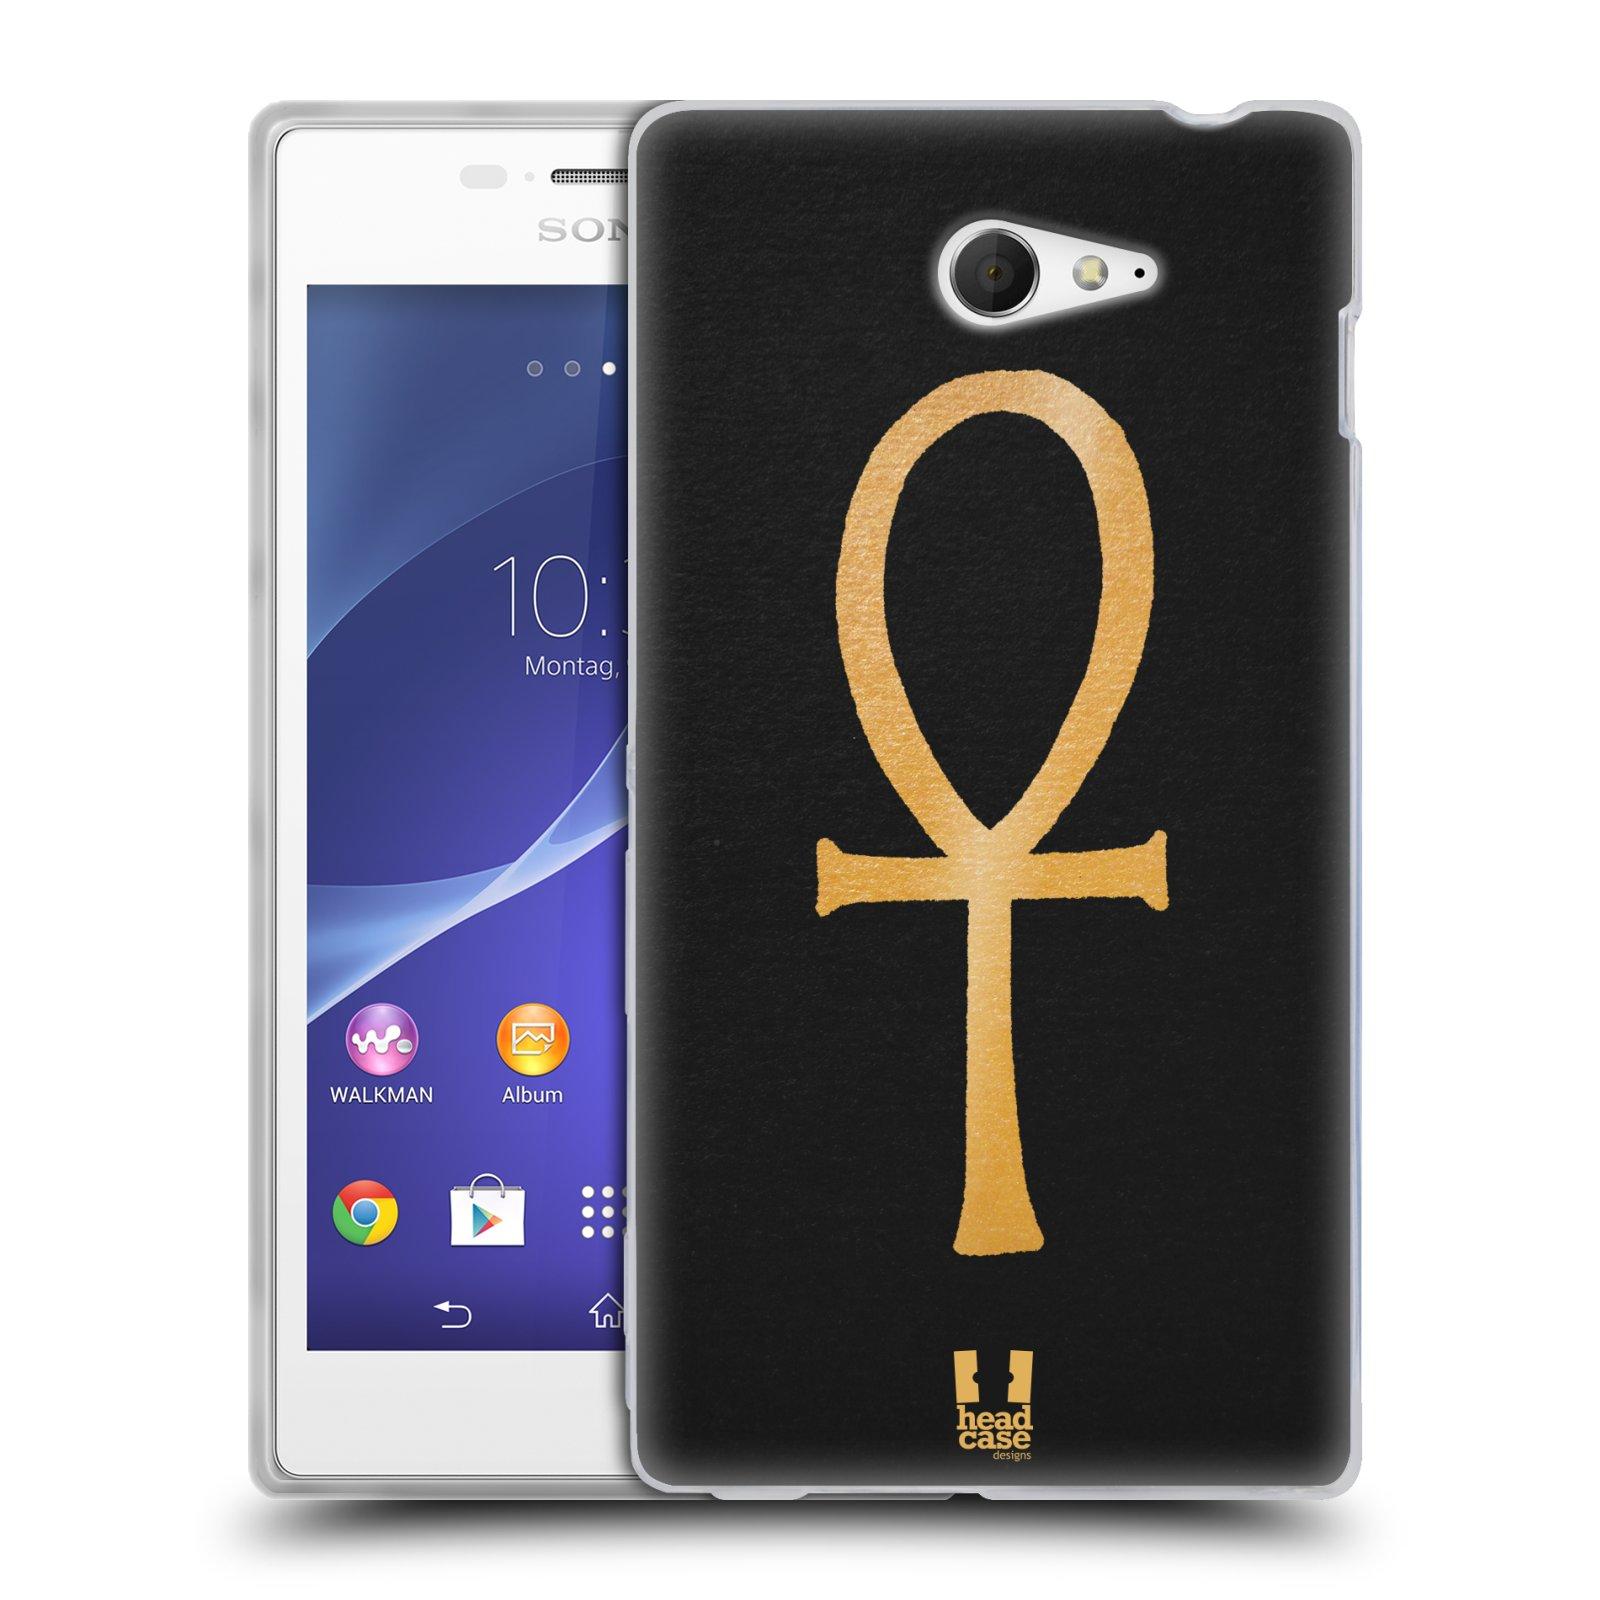 Silikonové pouzdro na mobil Sony Xperia M2 D2303 HEAD CASE EGYPT ANKH NILSKÝ KŘÍŽ (Silikonový Kryt či obal na mobilní telefon Sony Xperia M2)